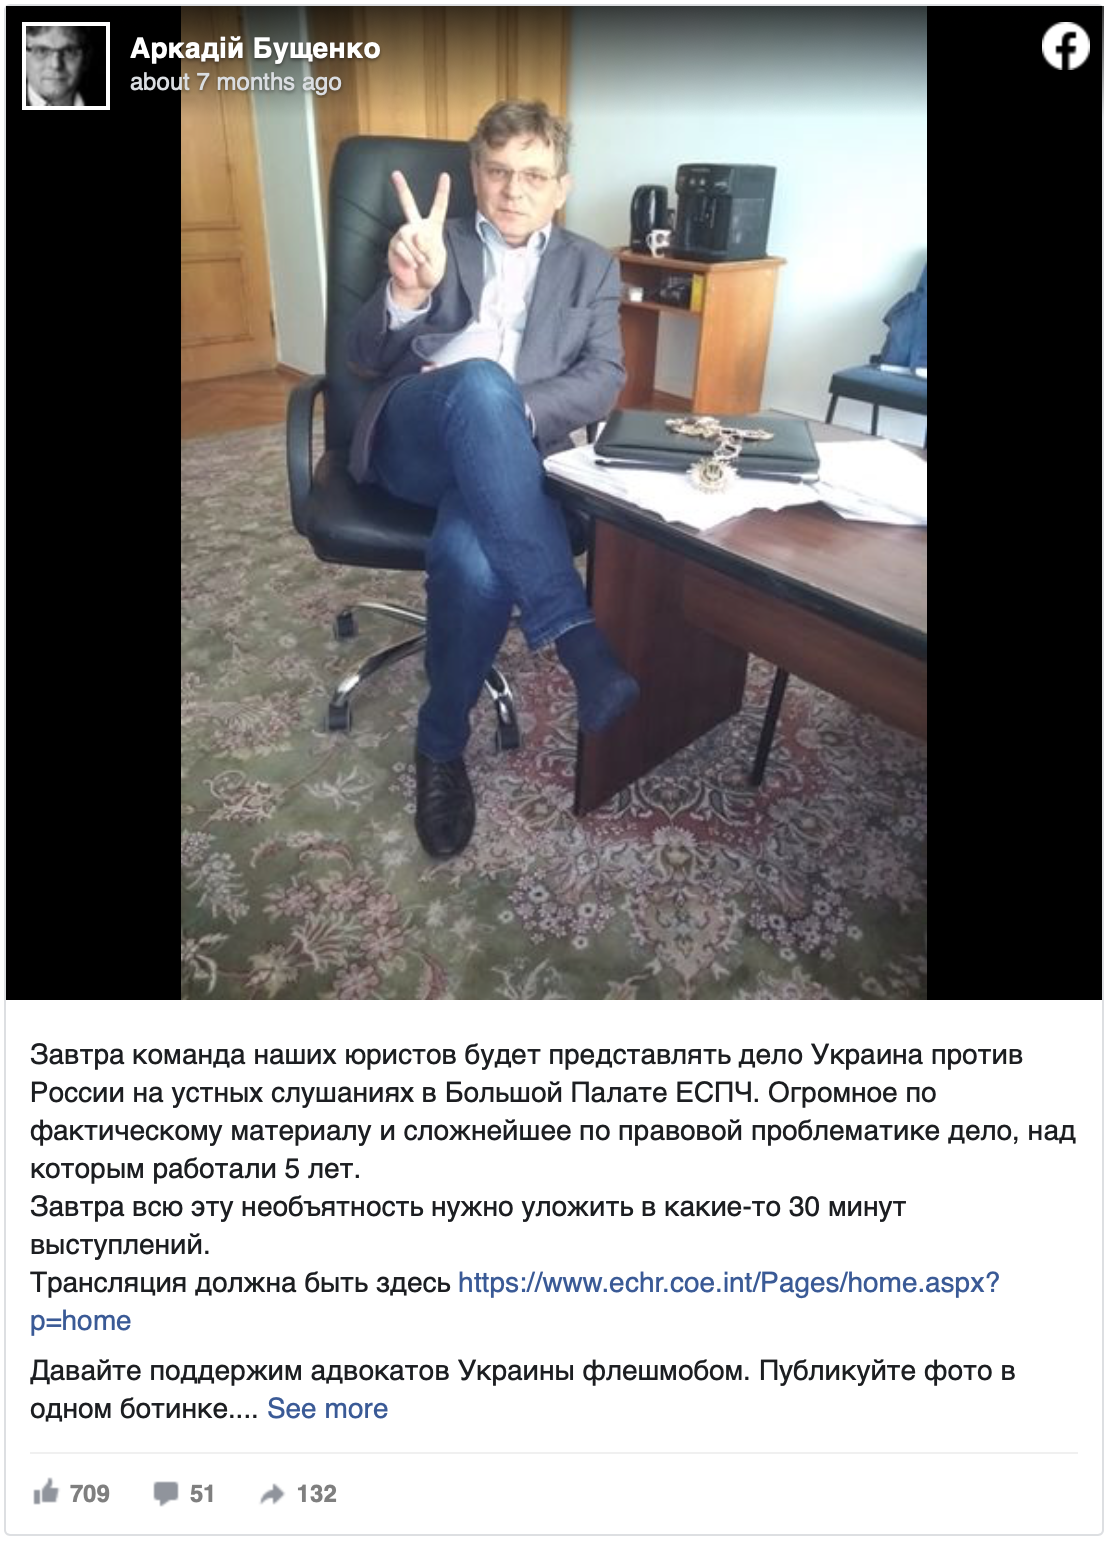 Facebook of Arkady Bushchenko